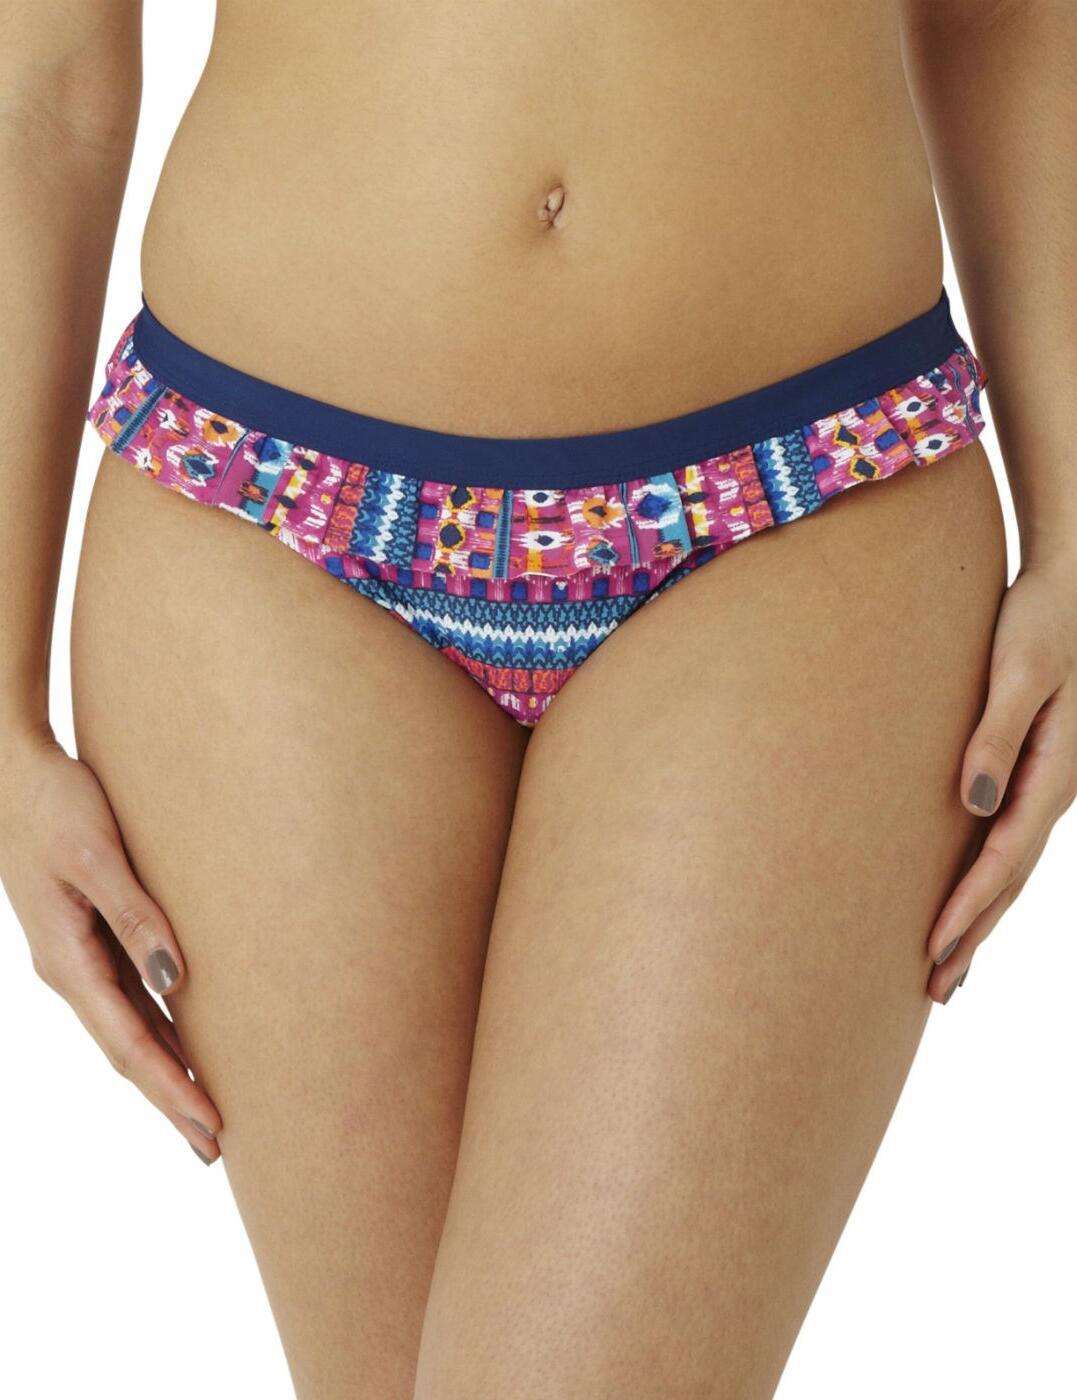 CW0179 Cleo Lexie Frill Bikini Pant Ikat Print - CW0179 Frill Pant